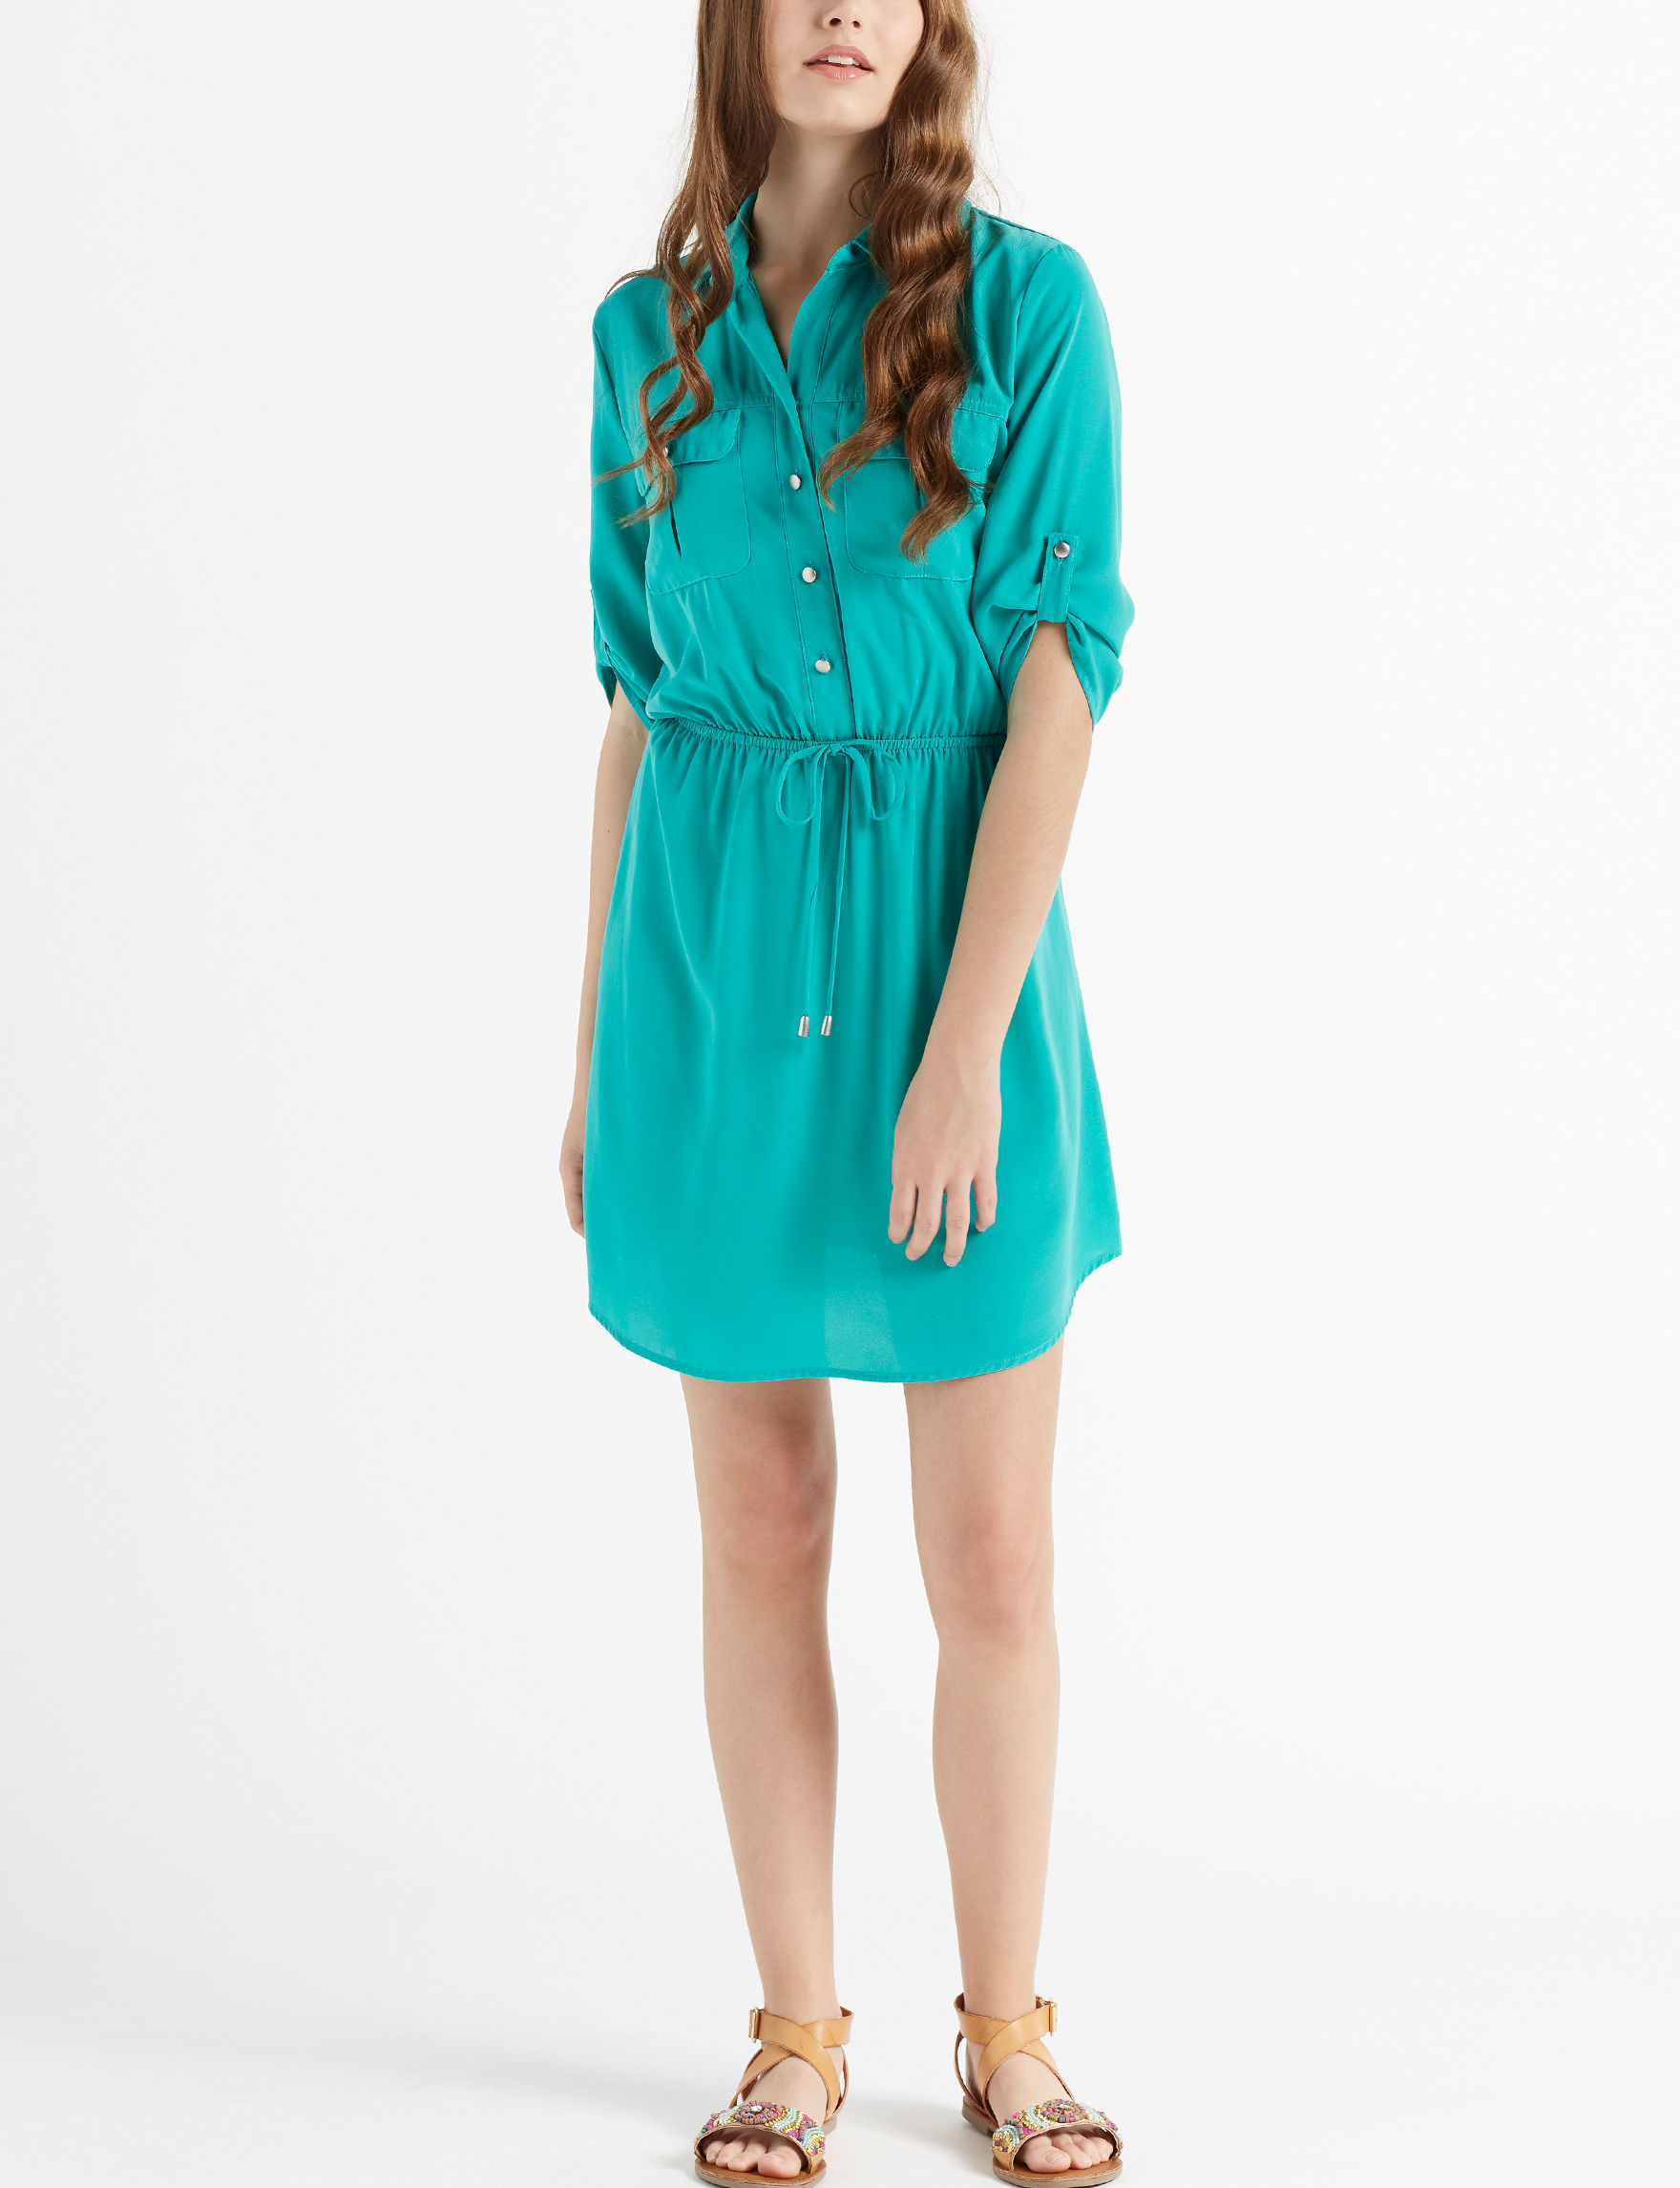 BeBop Green Everyday & Casual Shirt Dresses